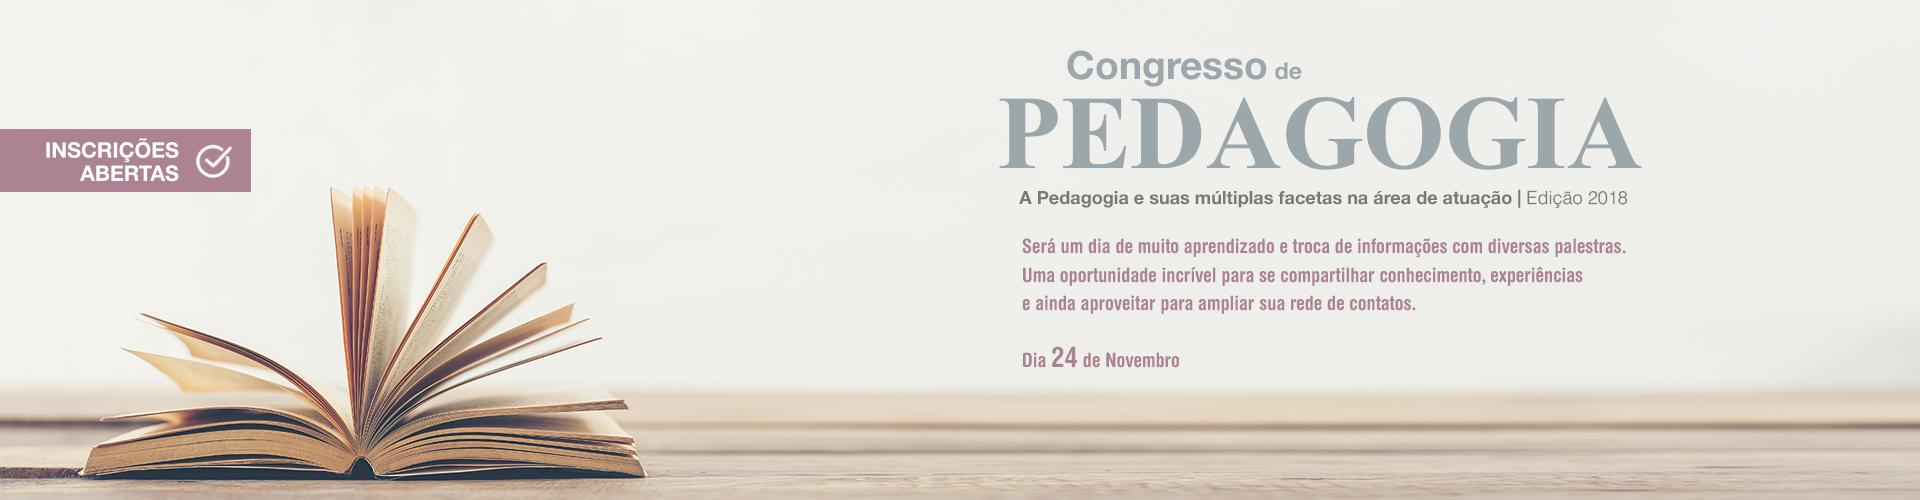 Banner-Congresso-de-Pedagogia-2018